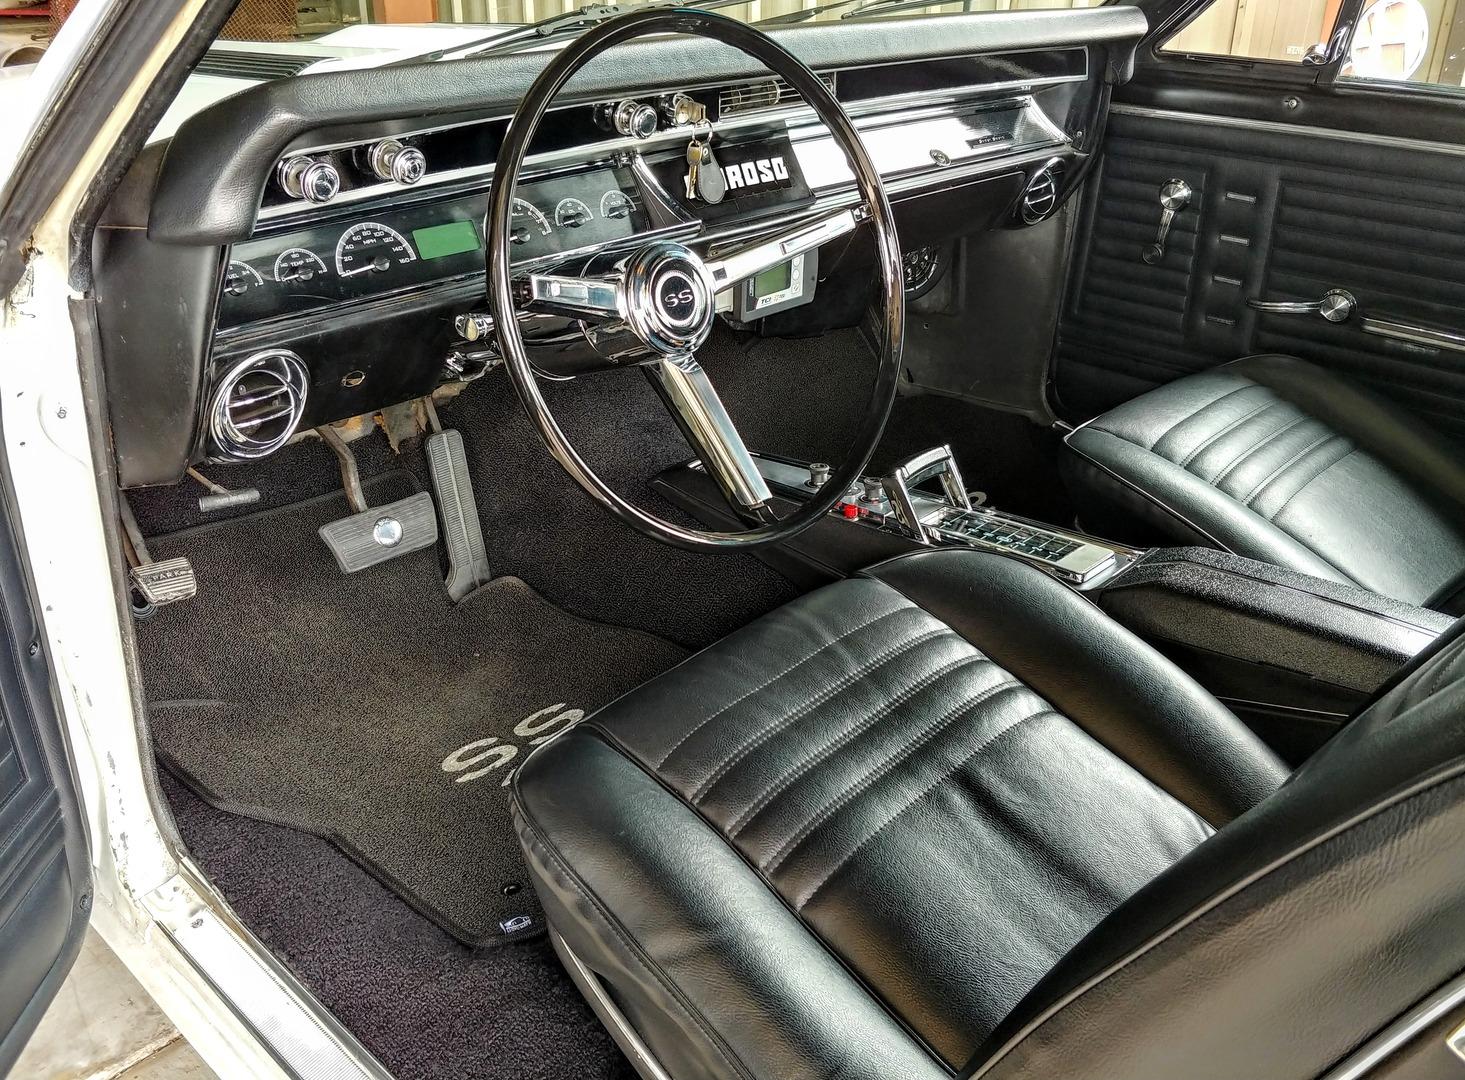 Used 1967 Chevrolet Chevelle -BIG BLOCK 454-OVERDRIVE AUTOMATIC- | Mundelein, IL